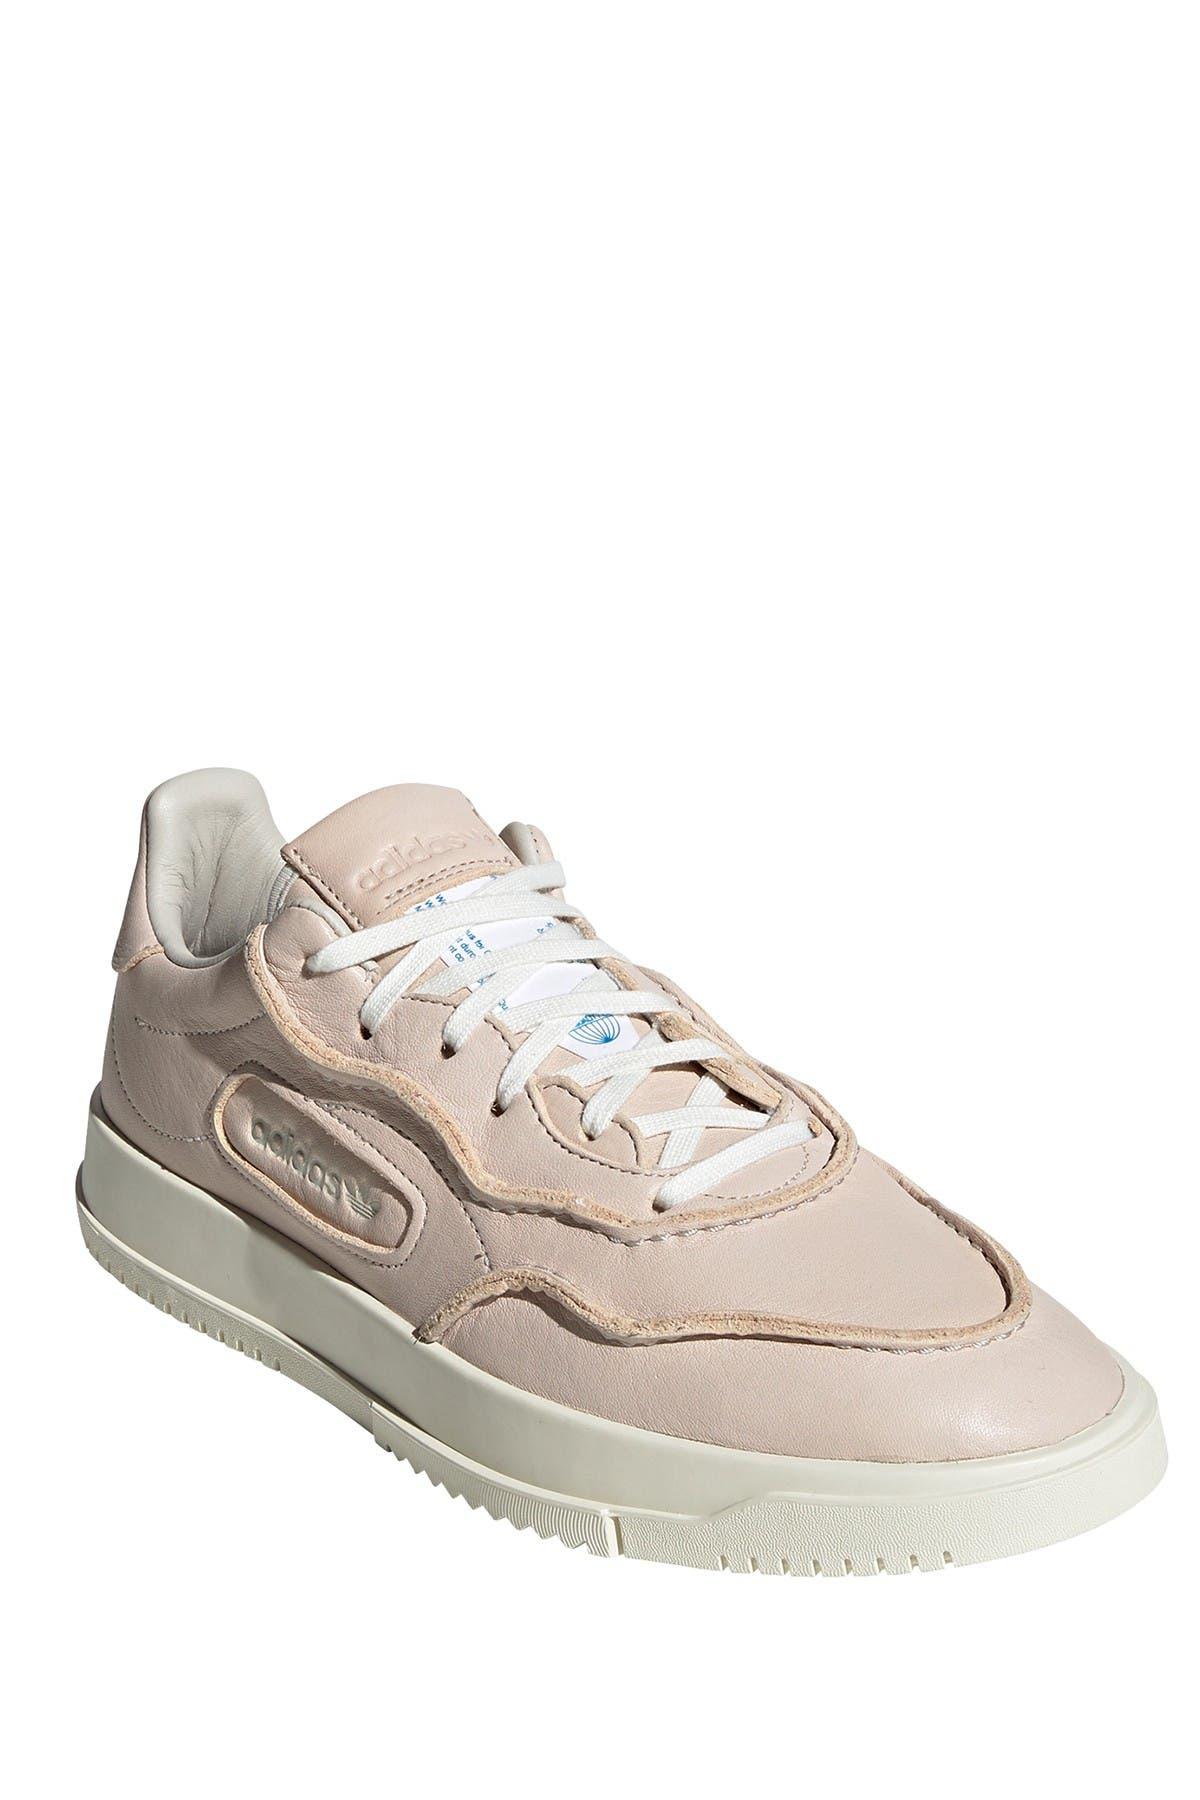 Image of adidas SC Premiere Sneaker